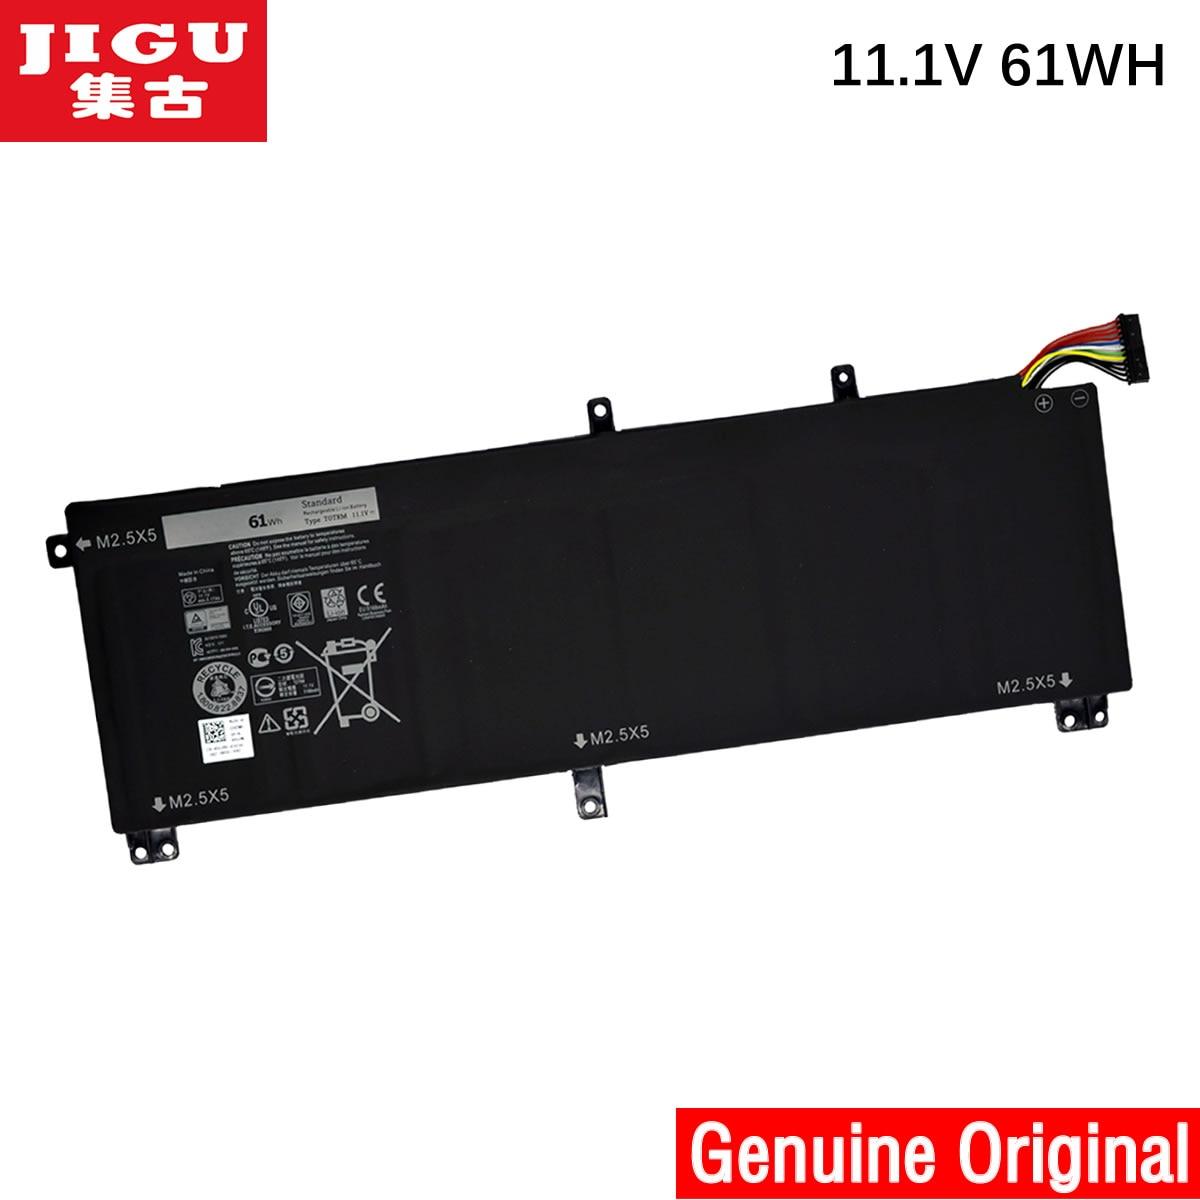 JIGU H76MV OH76MV T0TRM TOTRM Y758W Original Laptop Battery For DELL Precision M3800 XPS 15 9530 laptop parts for dell precision m3800 xps 15 9530 l522x dg95v hdd caddy bracket with sata connector cable